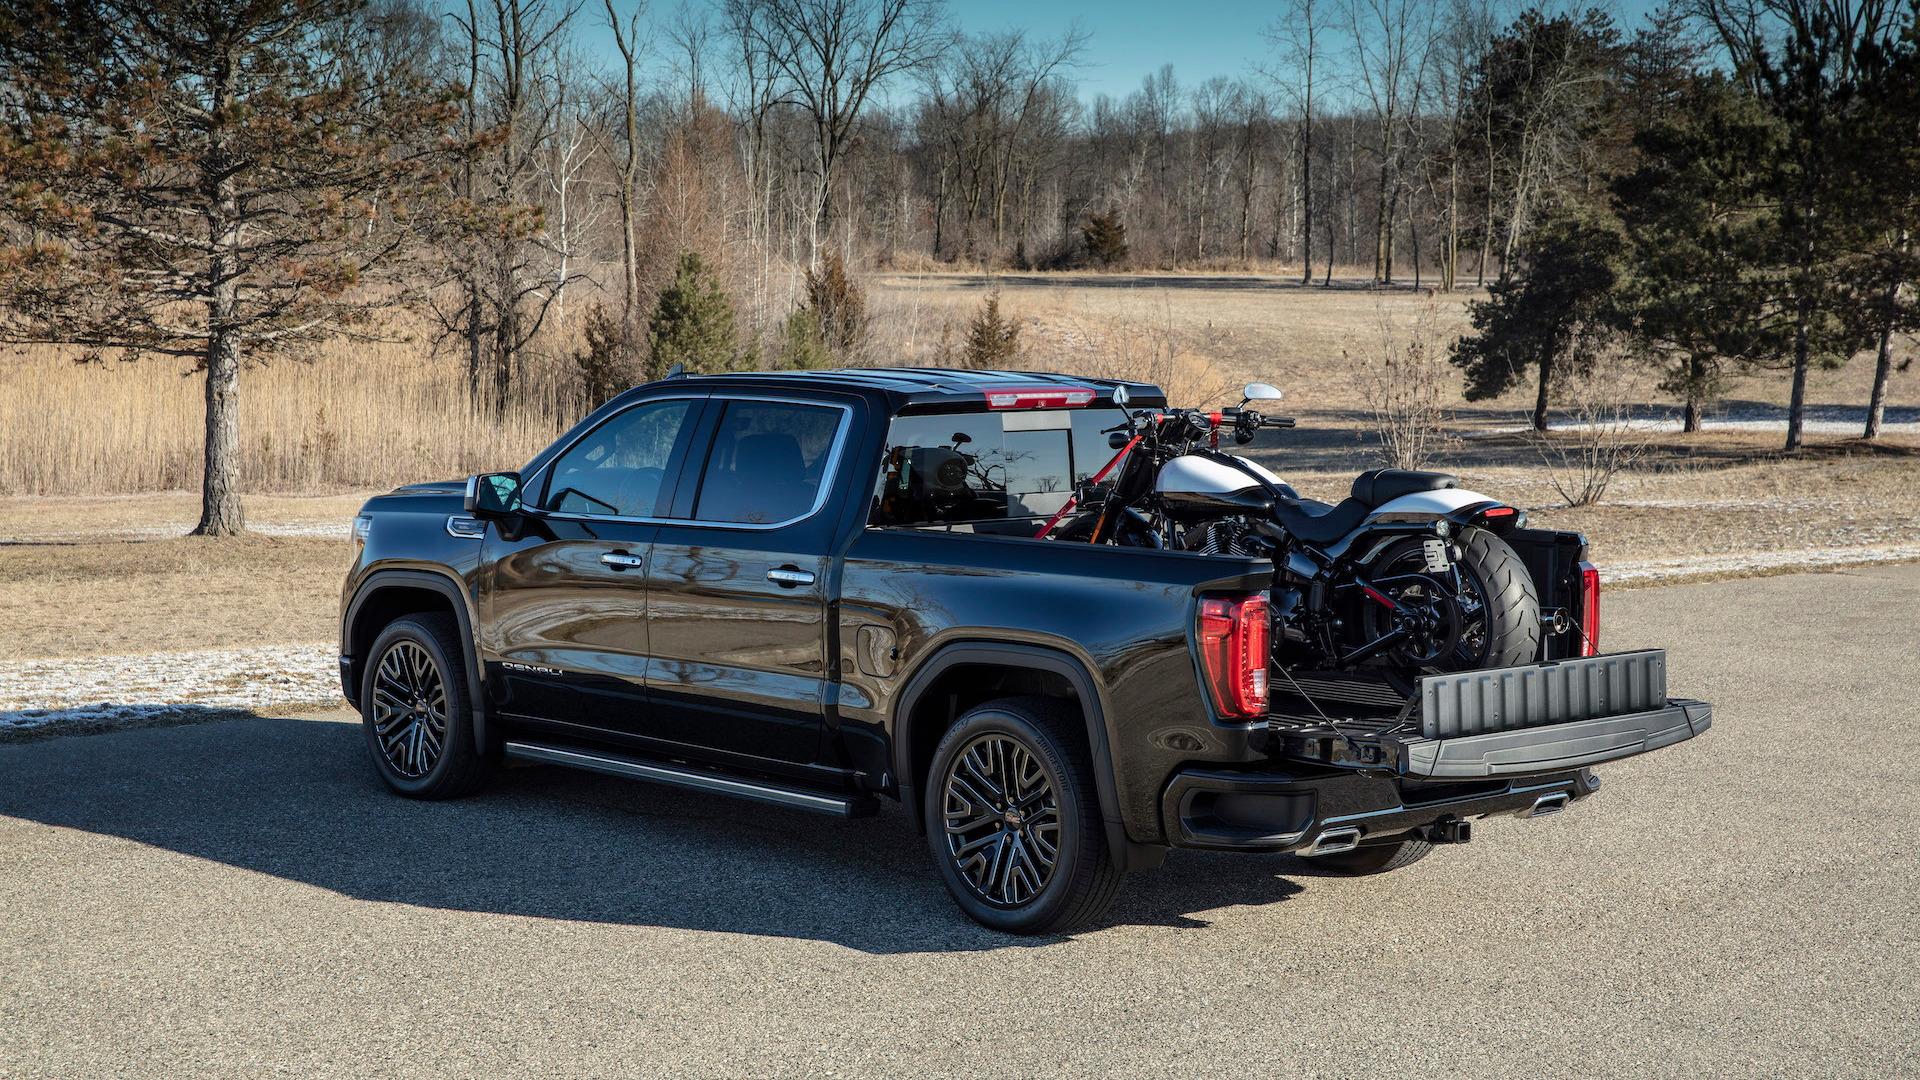 2019 GMC Sierra 1500 CarbonPro Edition